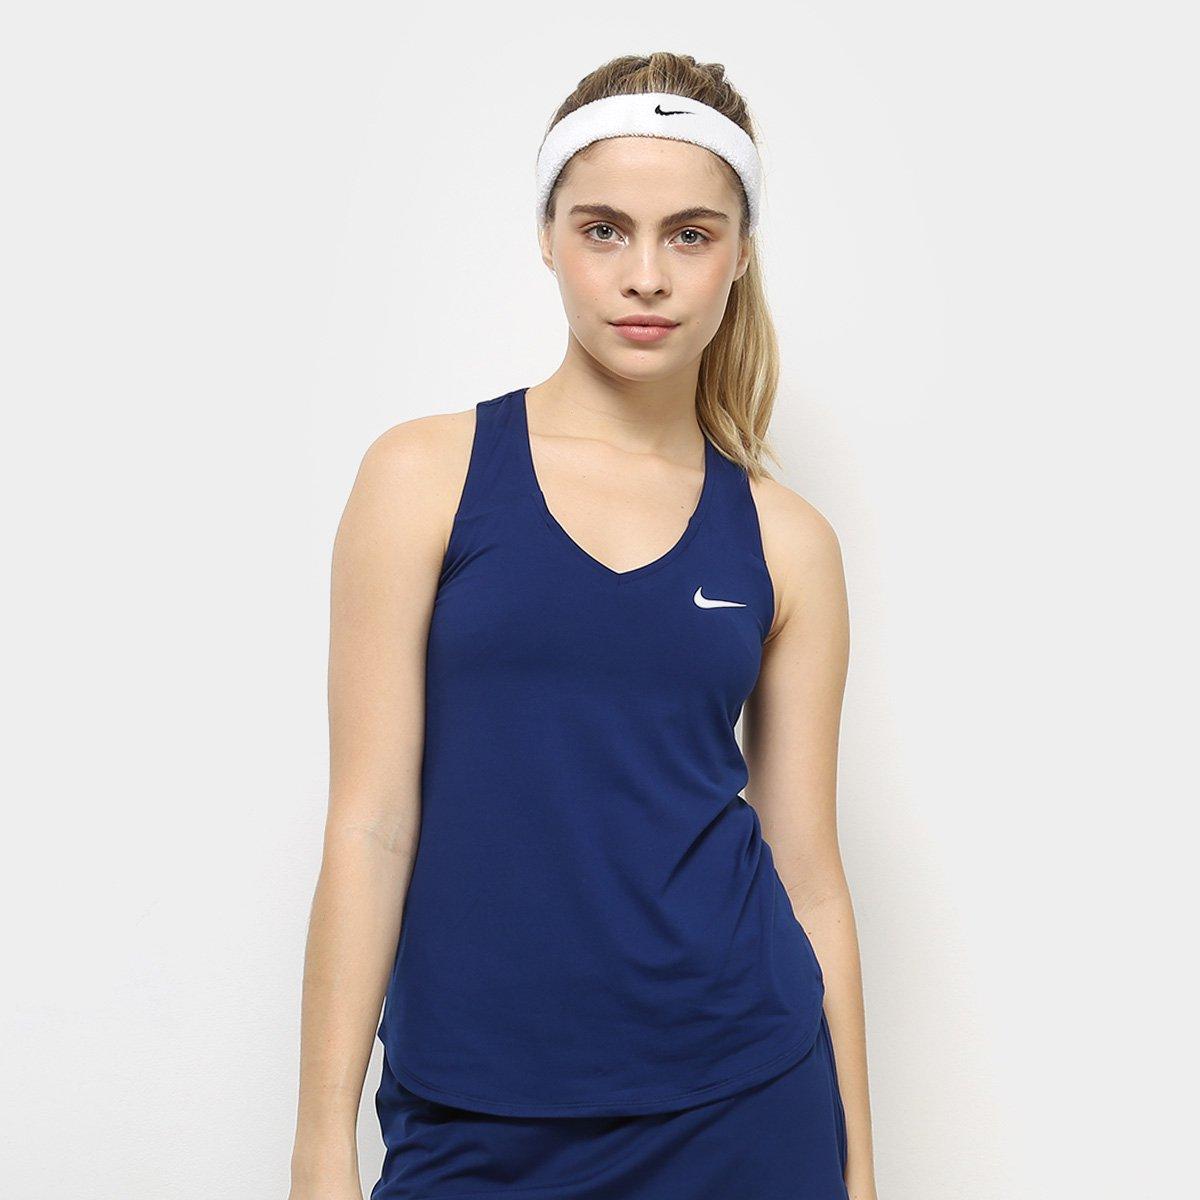 Nike Regata Nike Pure Feminina Marinho Regata Feminina Pure 5UIR4q1w